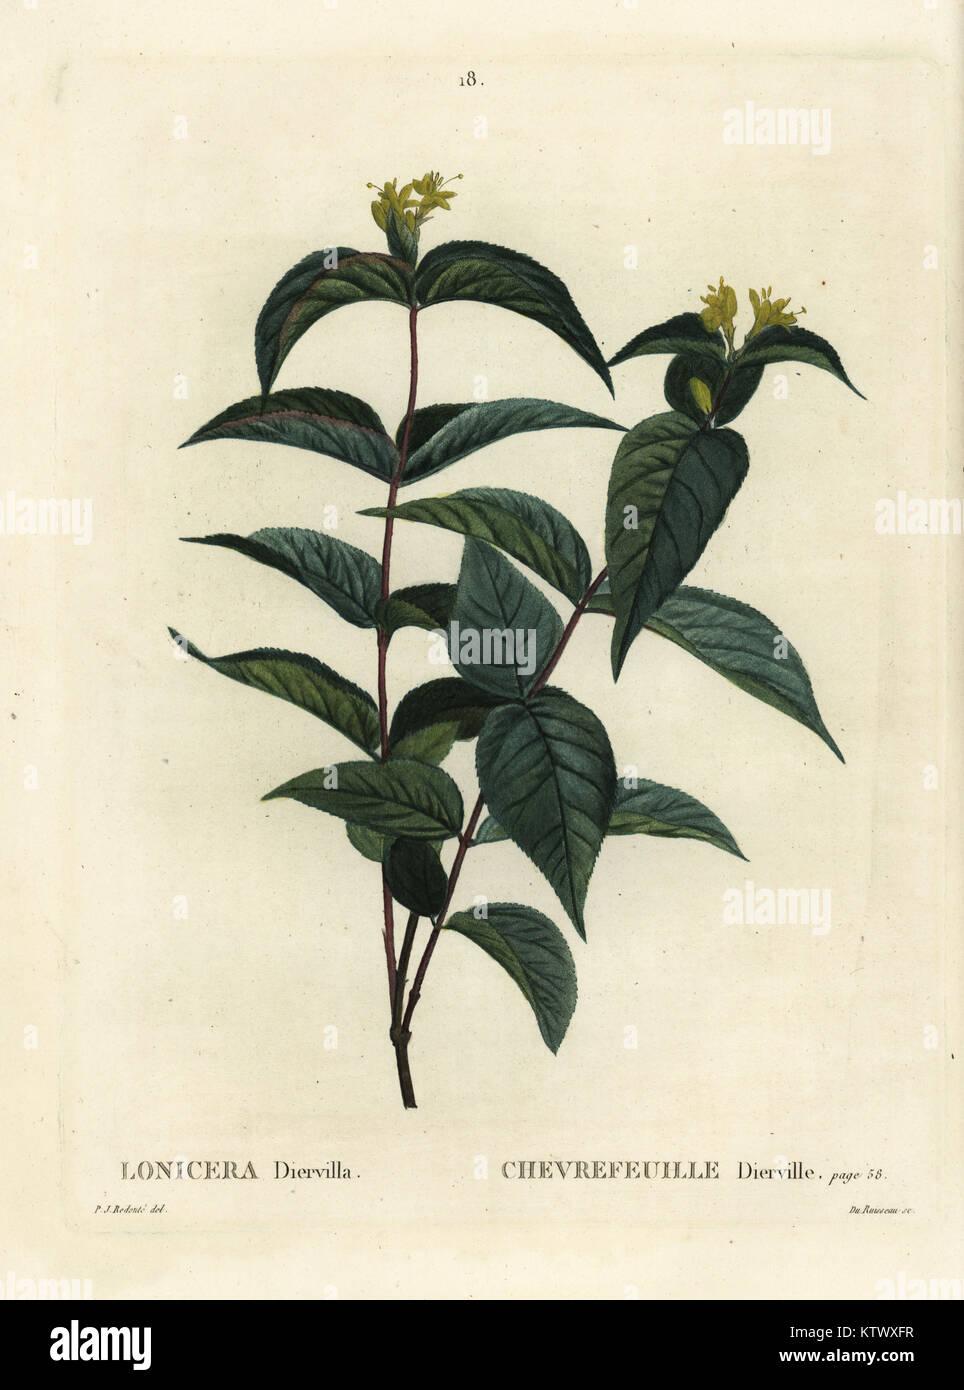 Northern bush honeysuckle, Diervilla lonicera (Lonicera diervilla). Handcoloured stipple engraving by Du Ruisseau - Stock Image